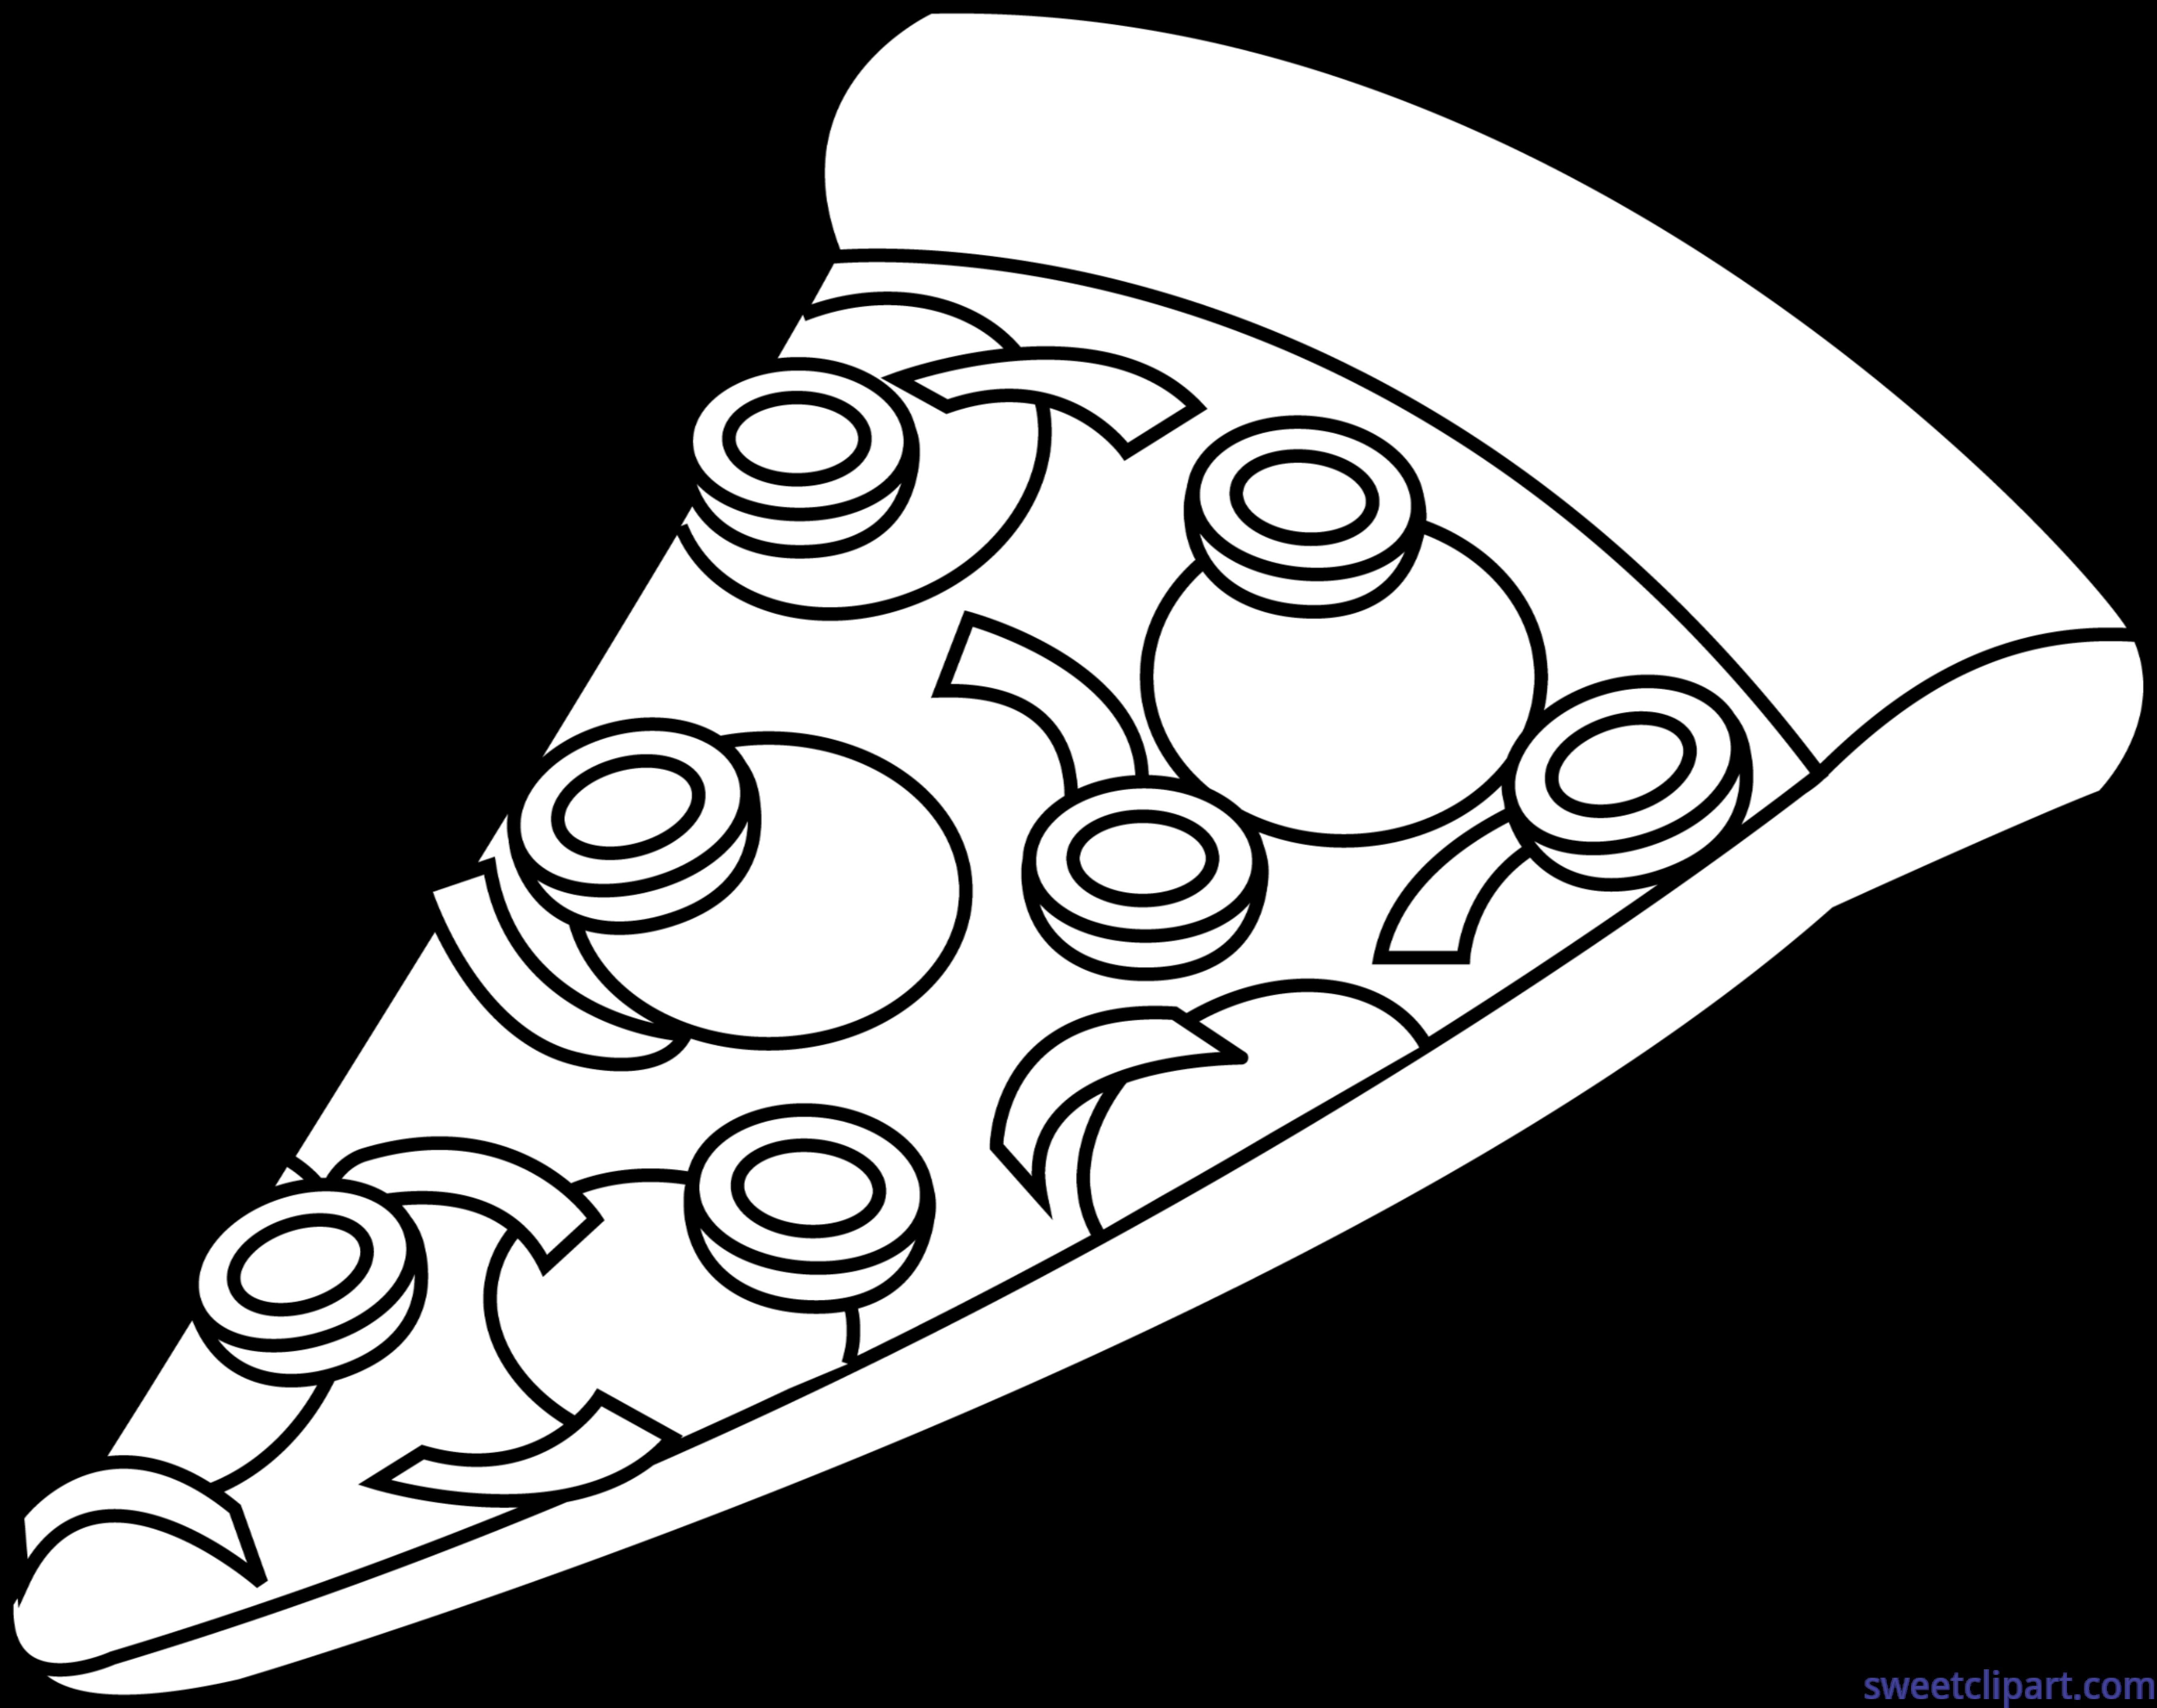 Combo lineart clip art. Pizza clipart pizza slice